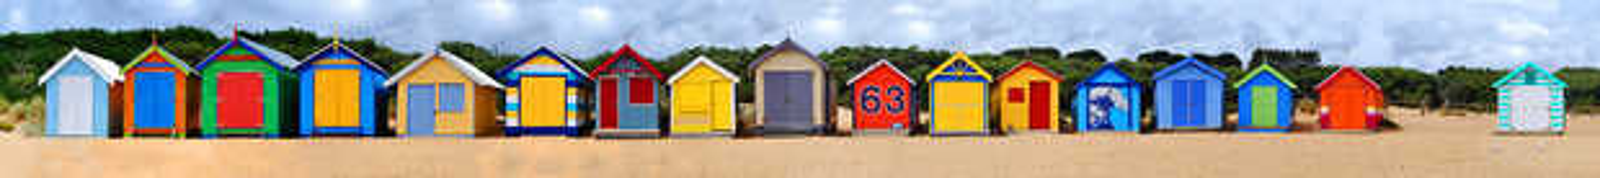 Brighton Beach Huts III - Michael Warrilow